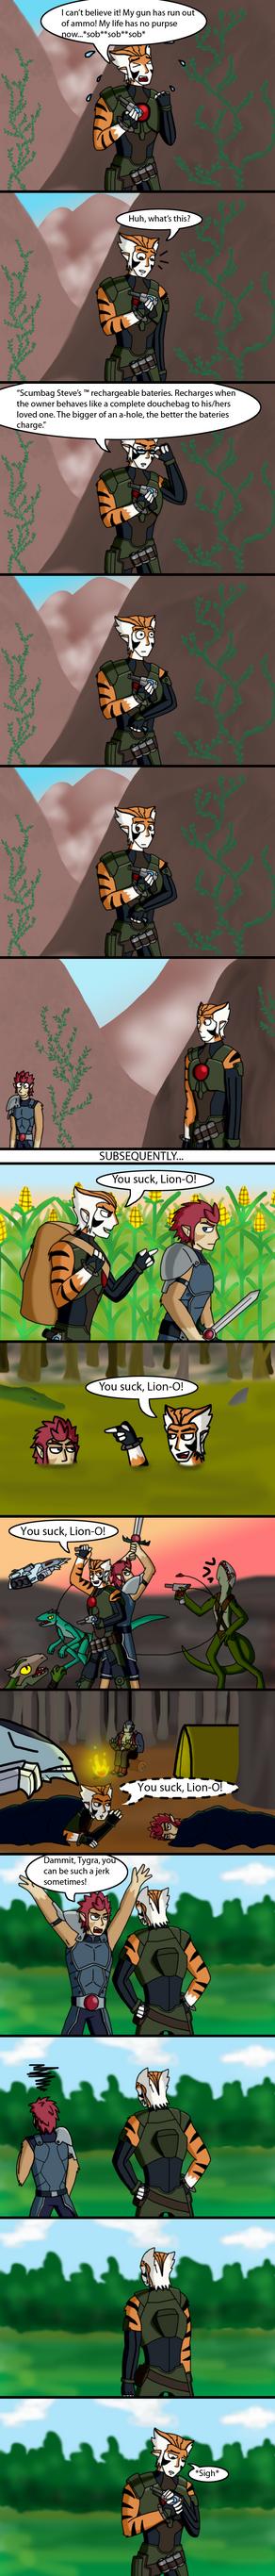 Misunderstood Tygra... by Jackasaurusrex